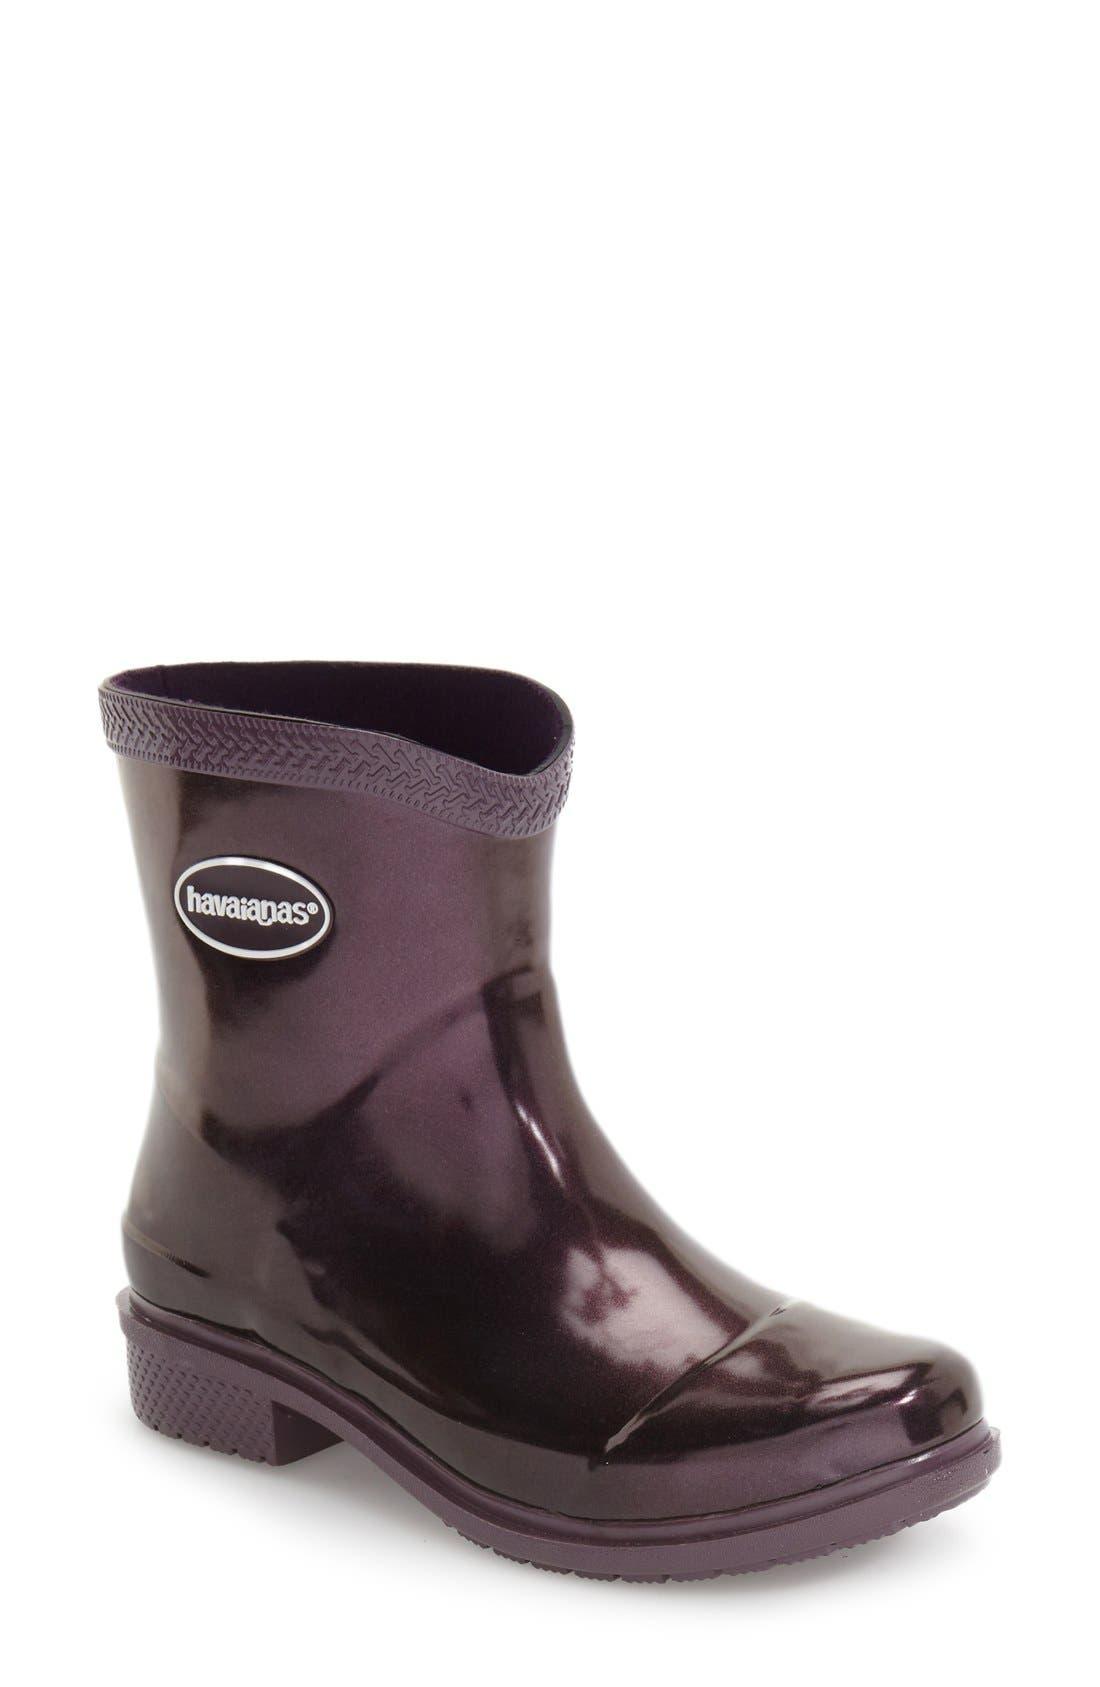 Main Image - Havaianas 'Galochas Low Metallic' Waterproof Rain Boot (Women)